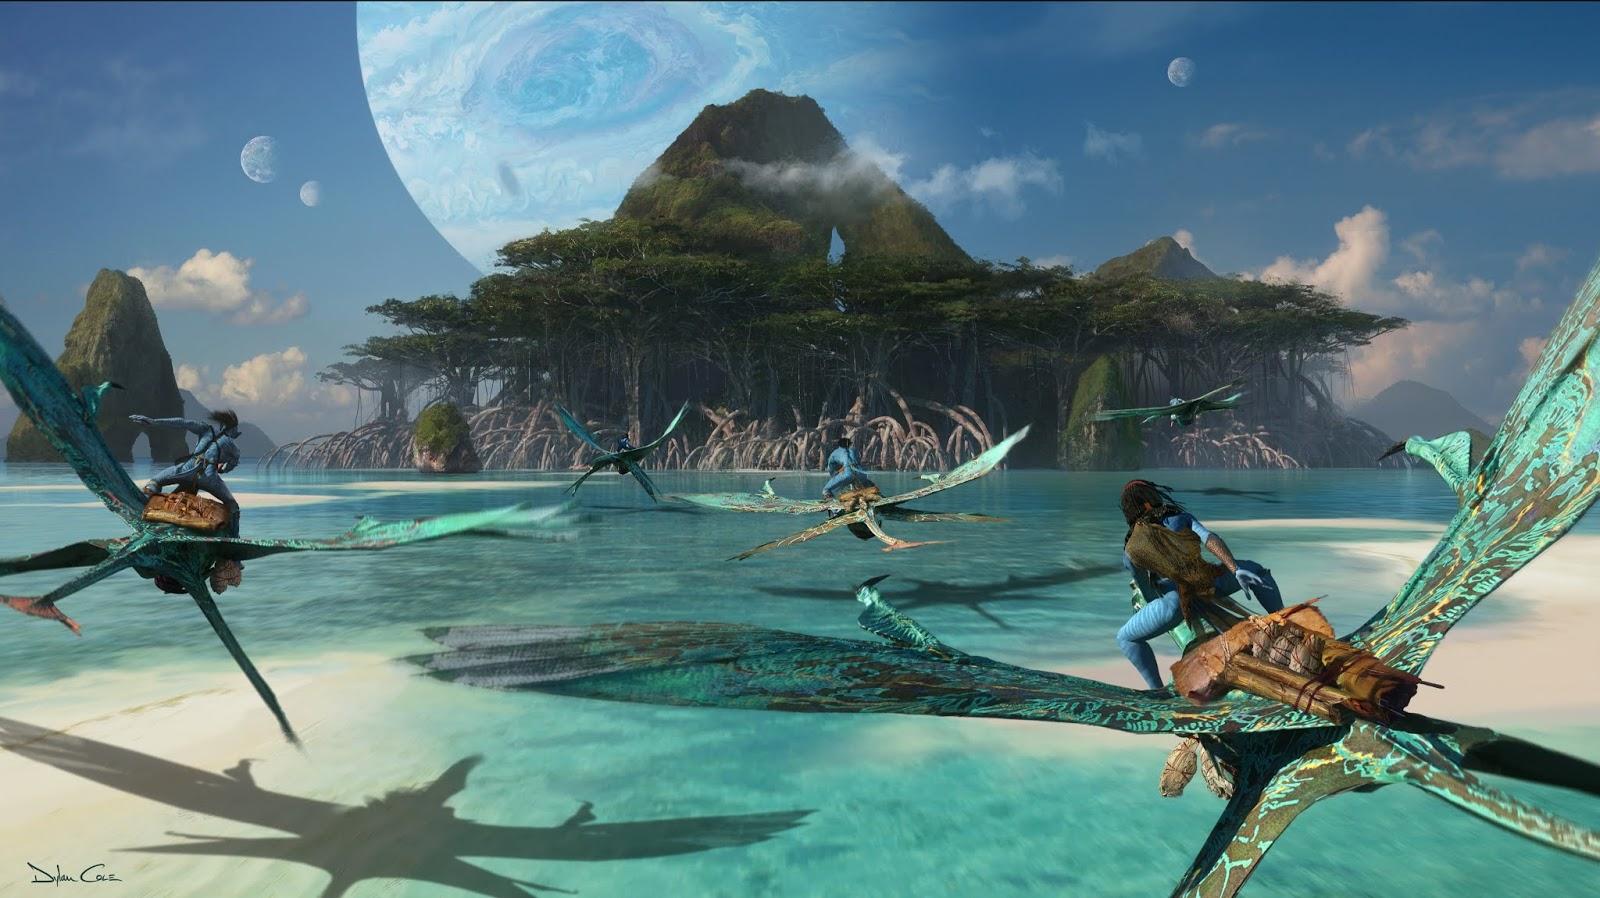 James Cameron shows filming underwater scenes in Avatar 2